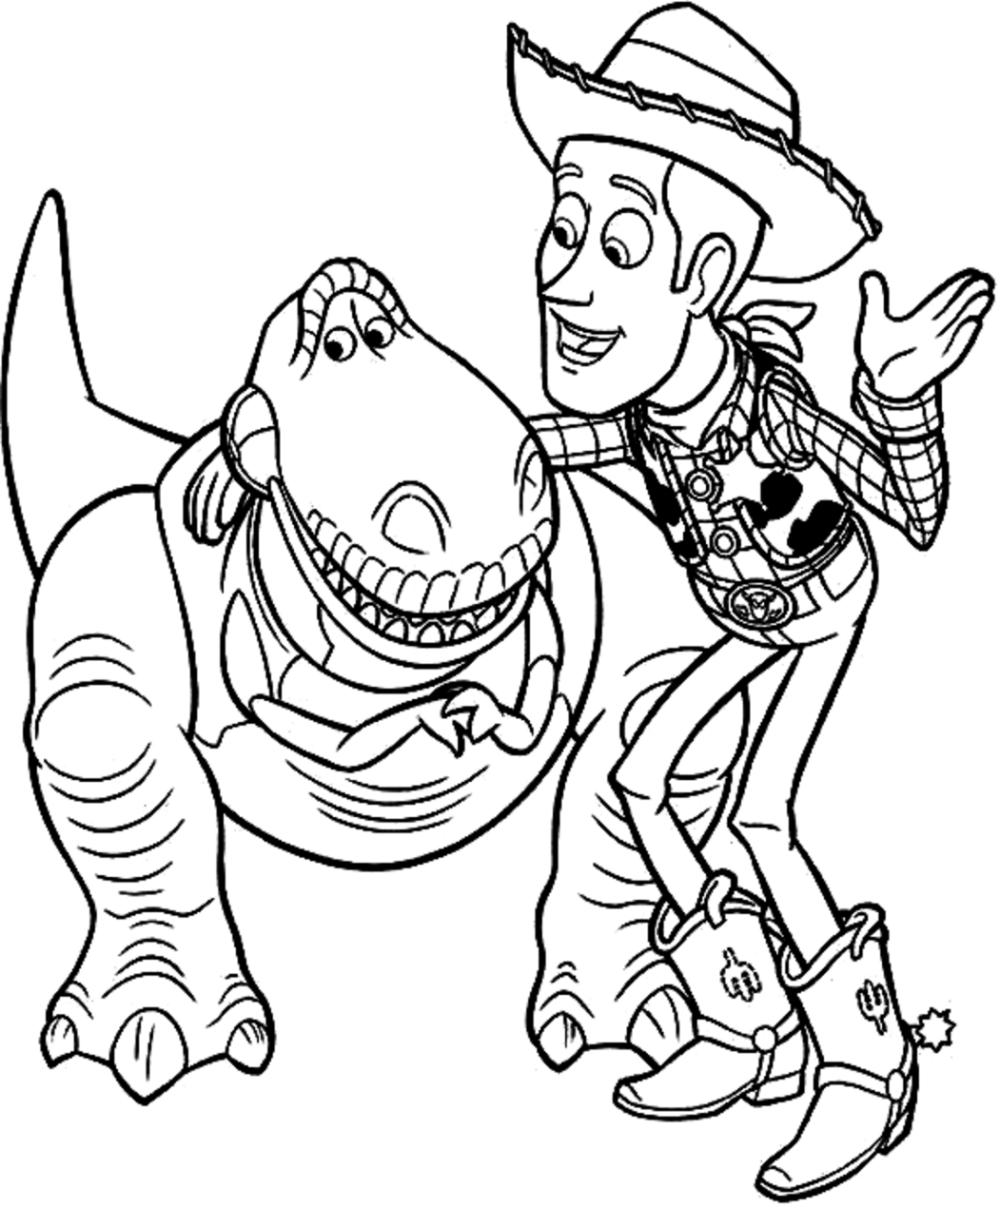 Imagenes Para Pintar De Toy Story Para Colorear E Imprimir Buscar Con Google Toy Story Para Colorear Imagenes Para Pintar Imprimir Sobres